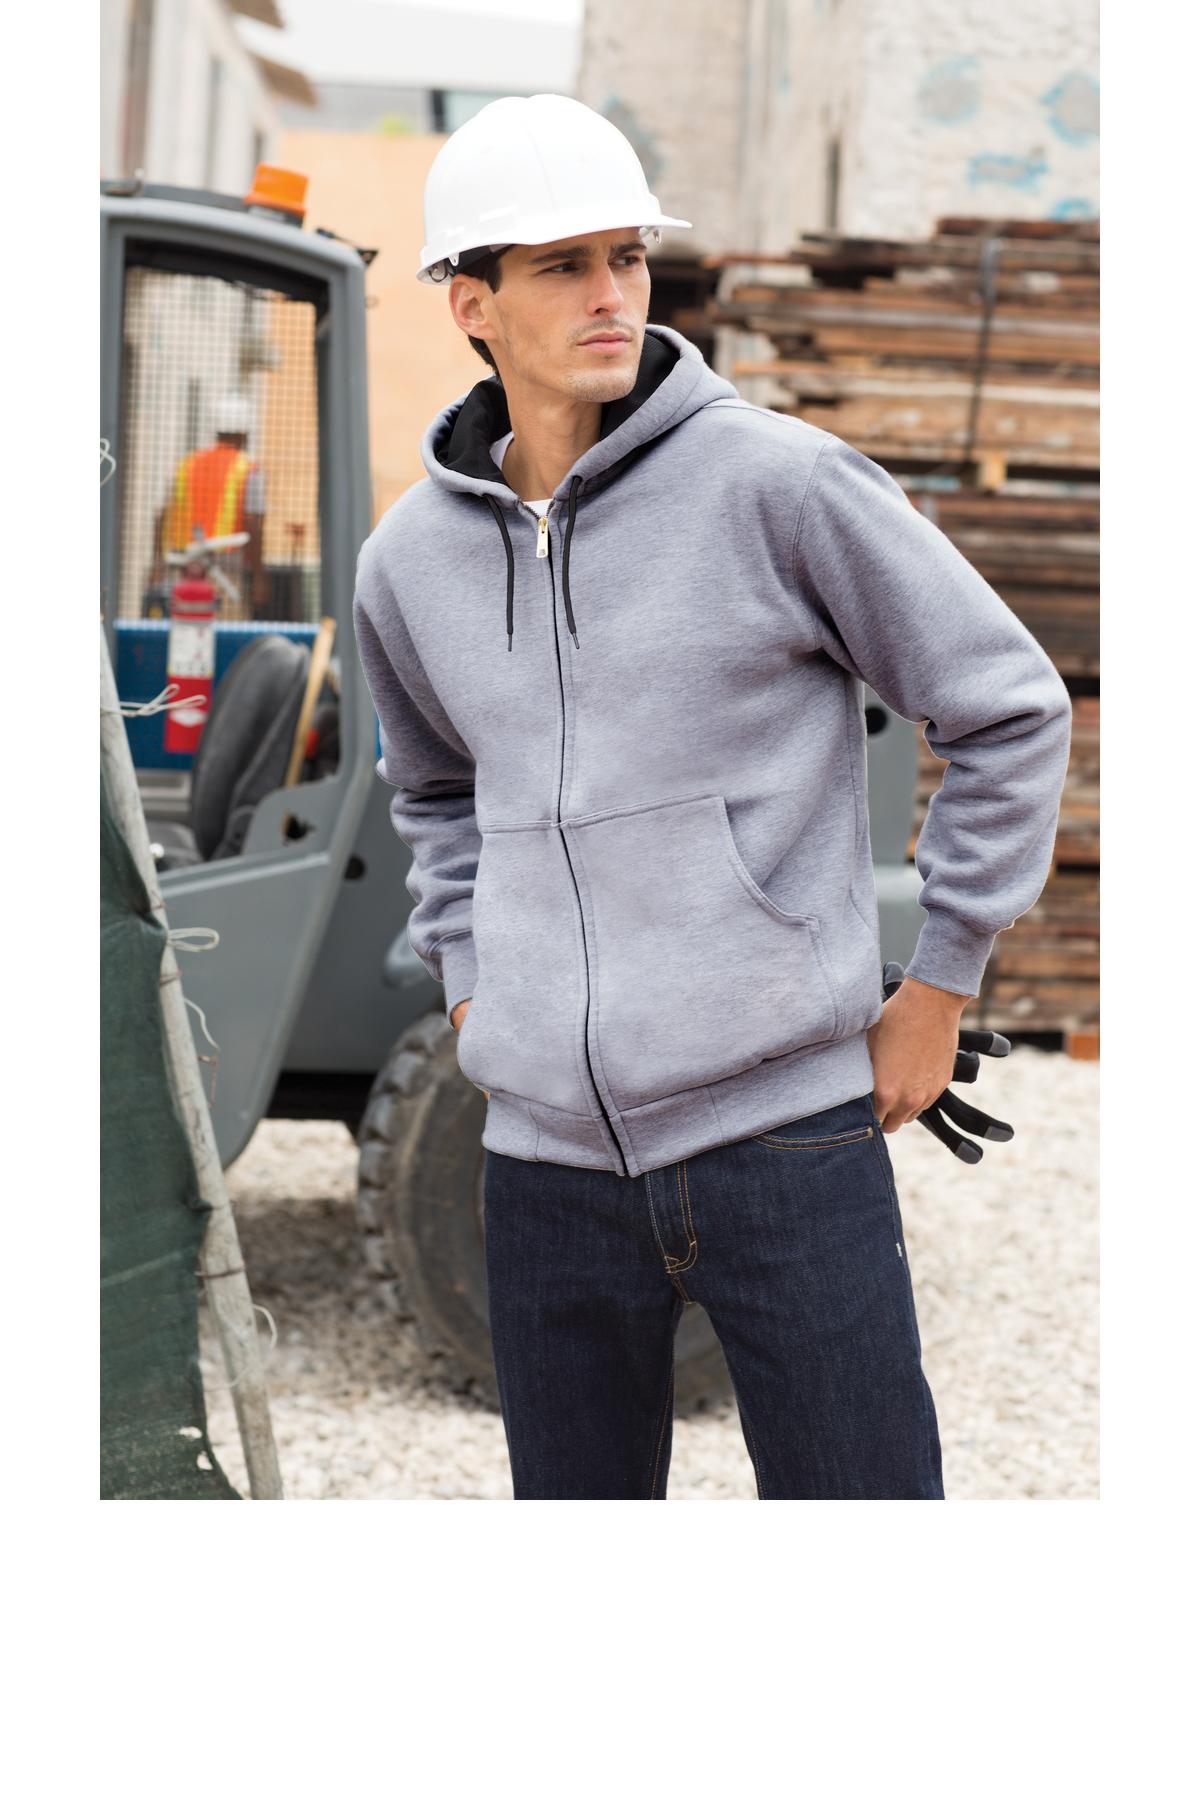 Mens Hooded Sweatshirt Classical Elegance and Originality Erika Costell Logo White S